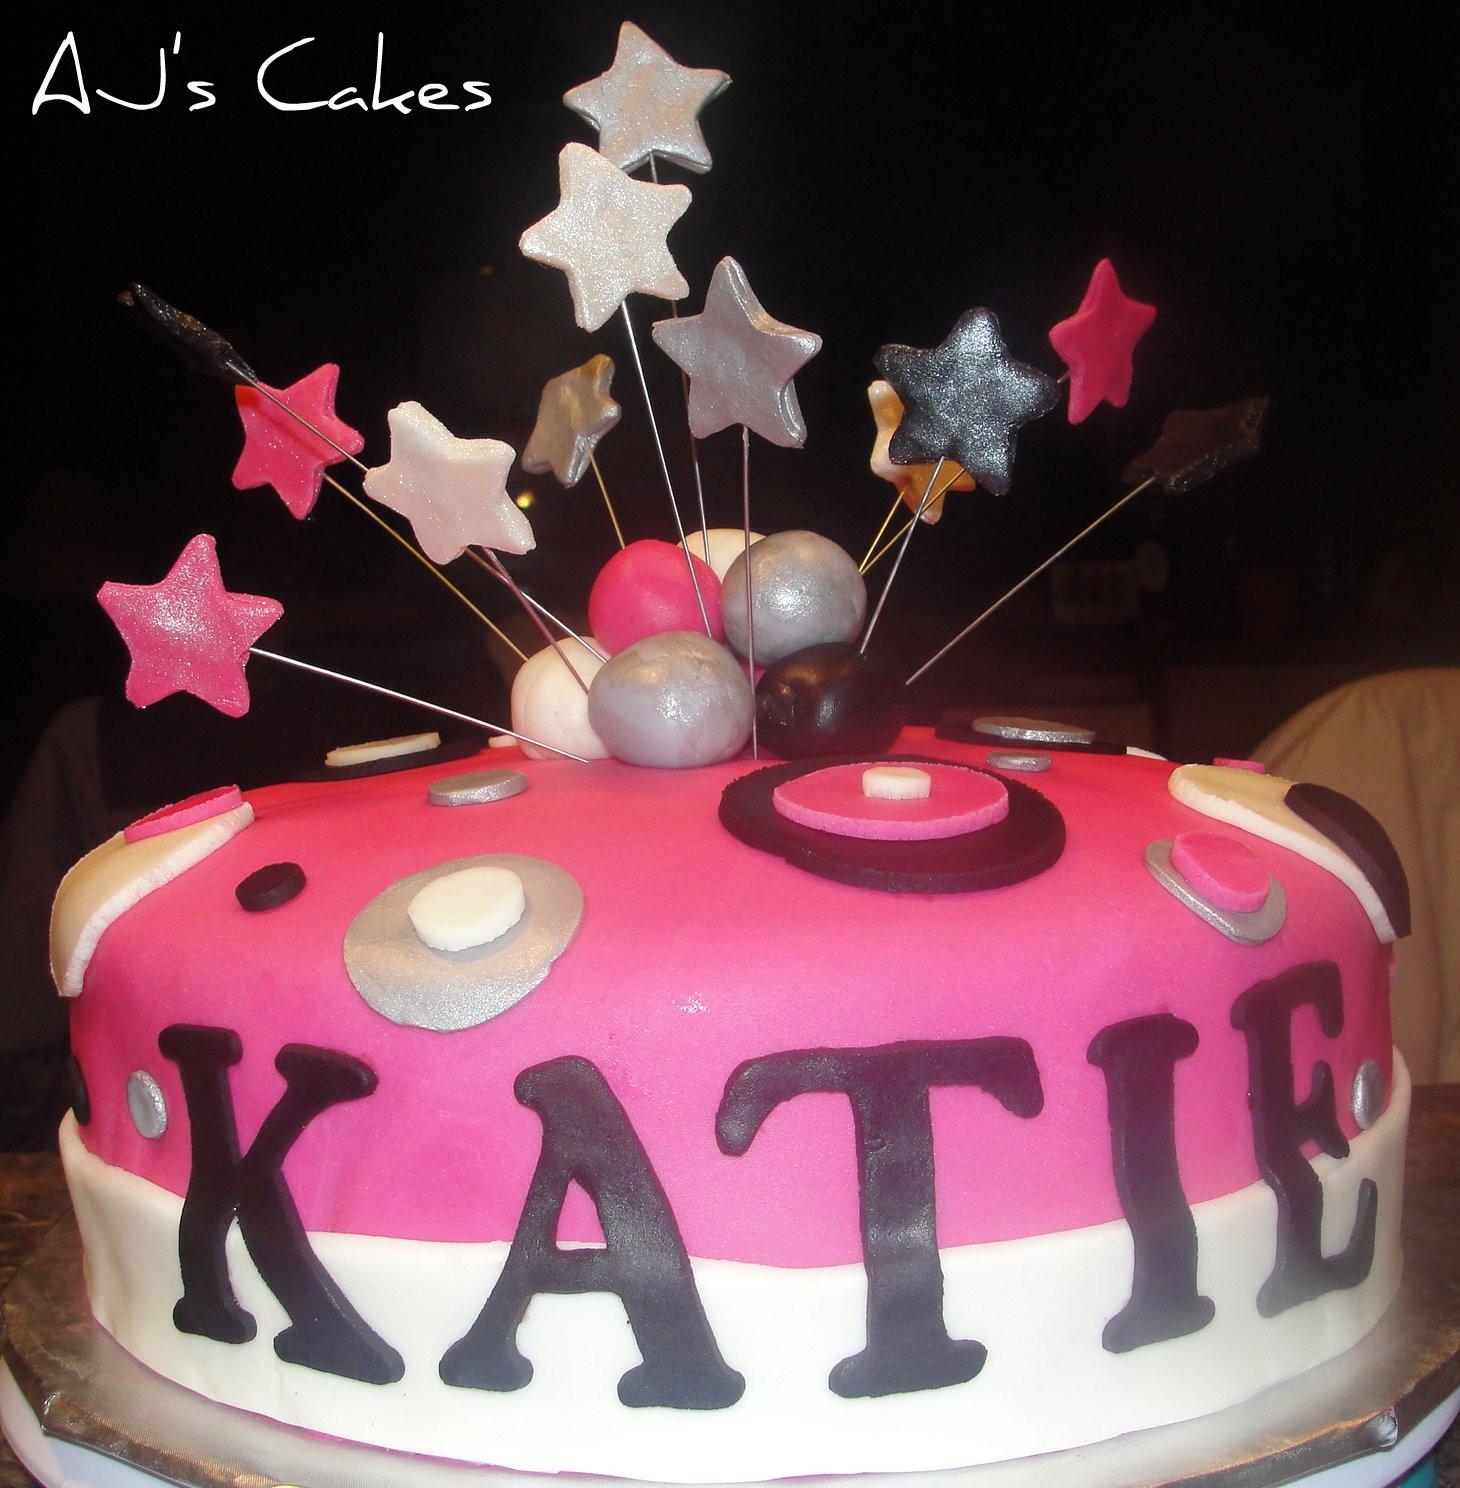 Best ideas about Happy Birthday Katie Cake . Save or Pin AJ s Cakes Katie s Birthday Cake Now.